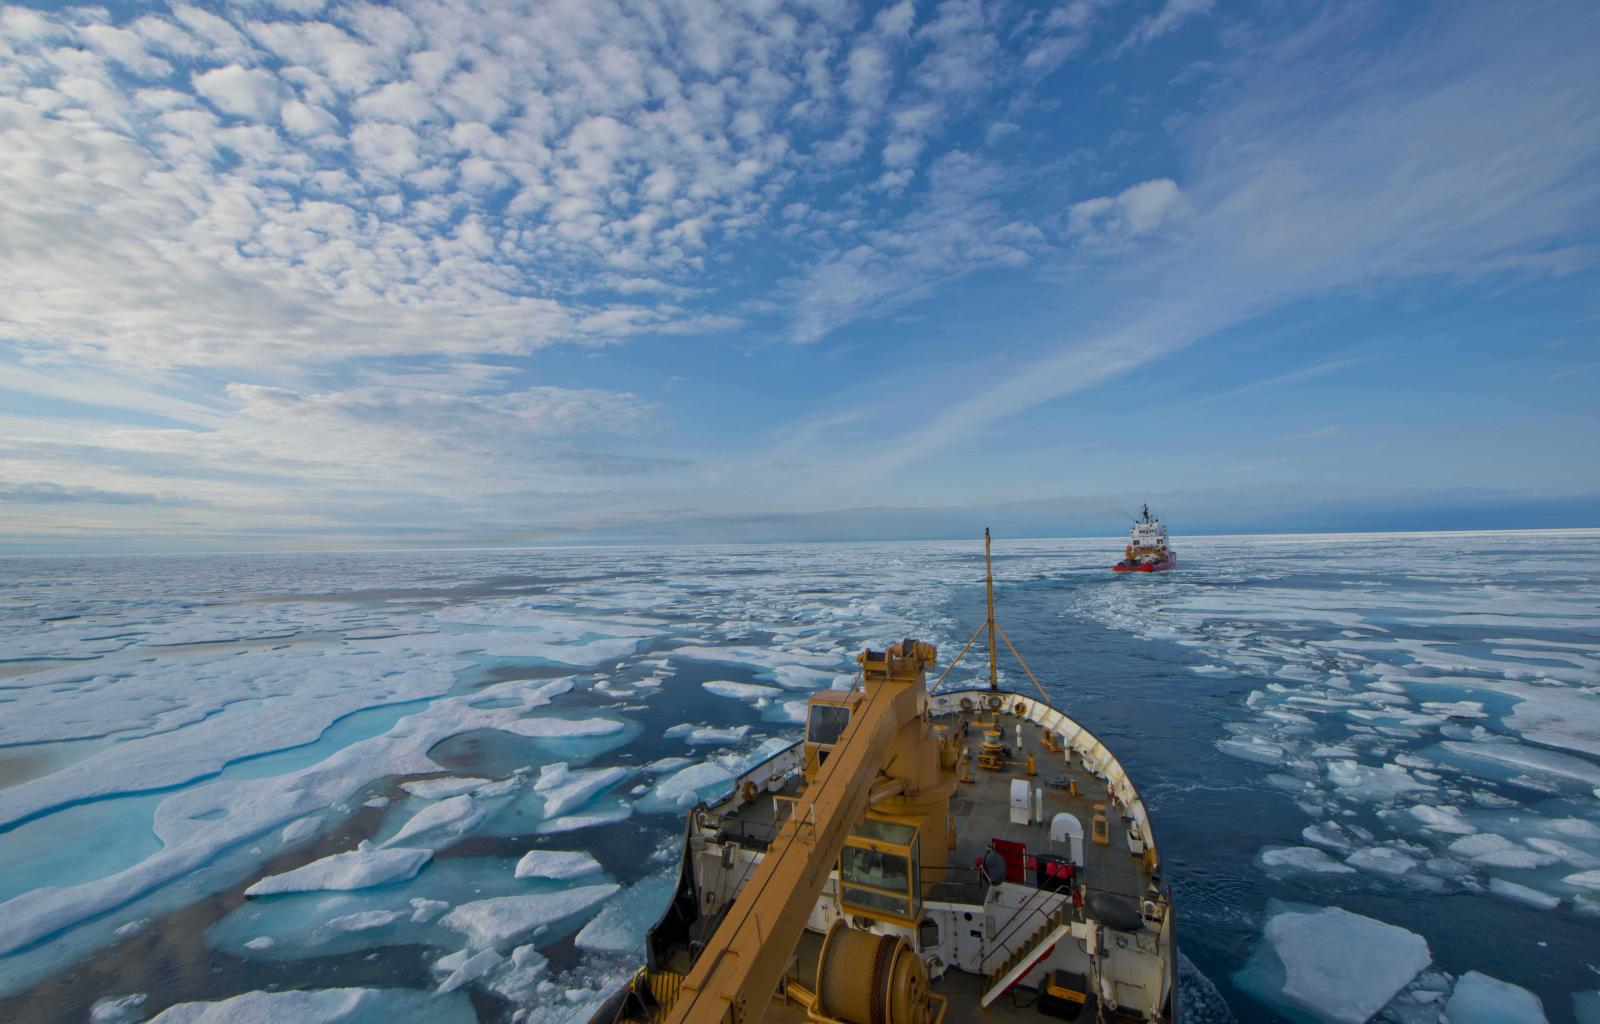 Shipping-Canada-NWP-pass.-Malte-H.-Courtesy-of-University-of-Ottawa